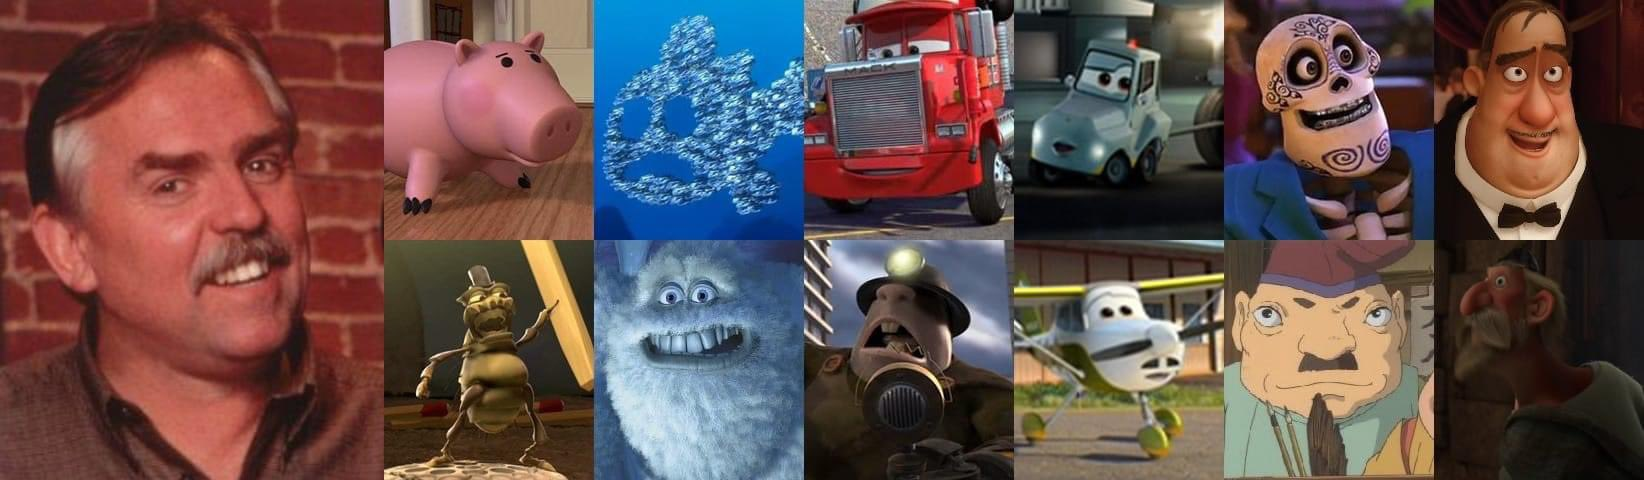 Happy belated birthday to Pixar voice favorite John Ratzenberger